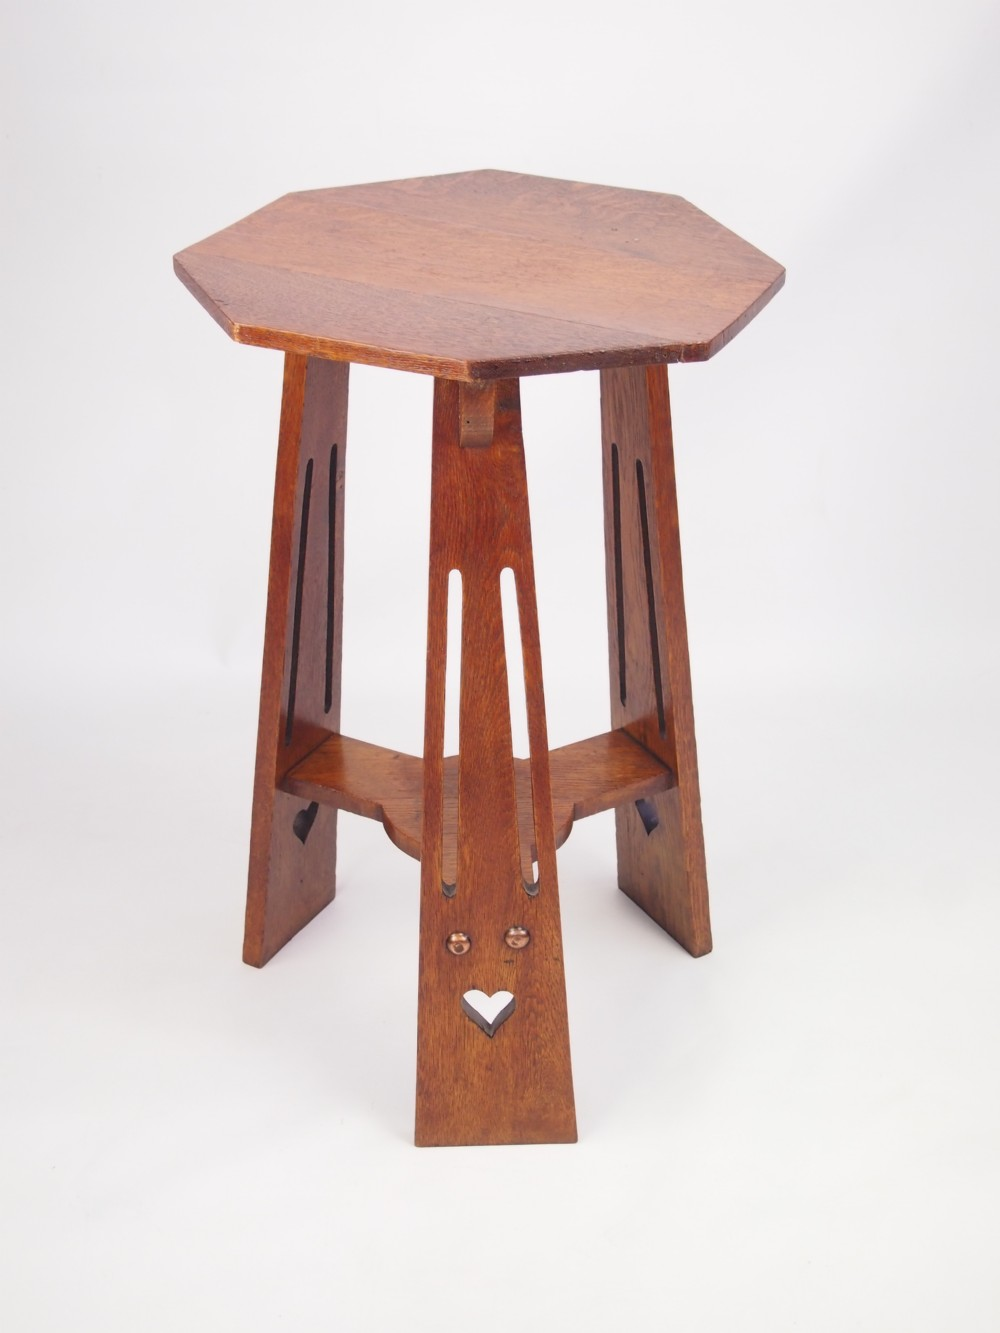 Antique edwardian arts and crafts oak lamp table 266469 antique edwardian arts and crafts oak lamp table mozeypictures Images